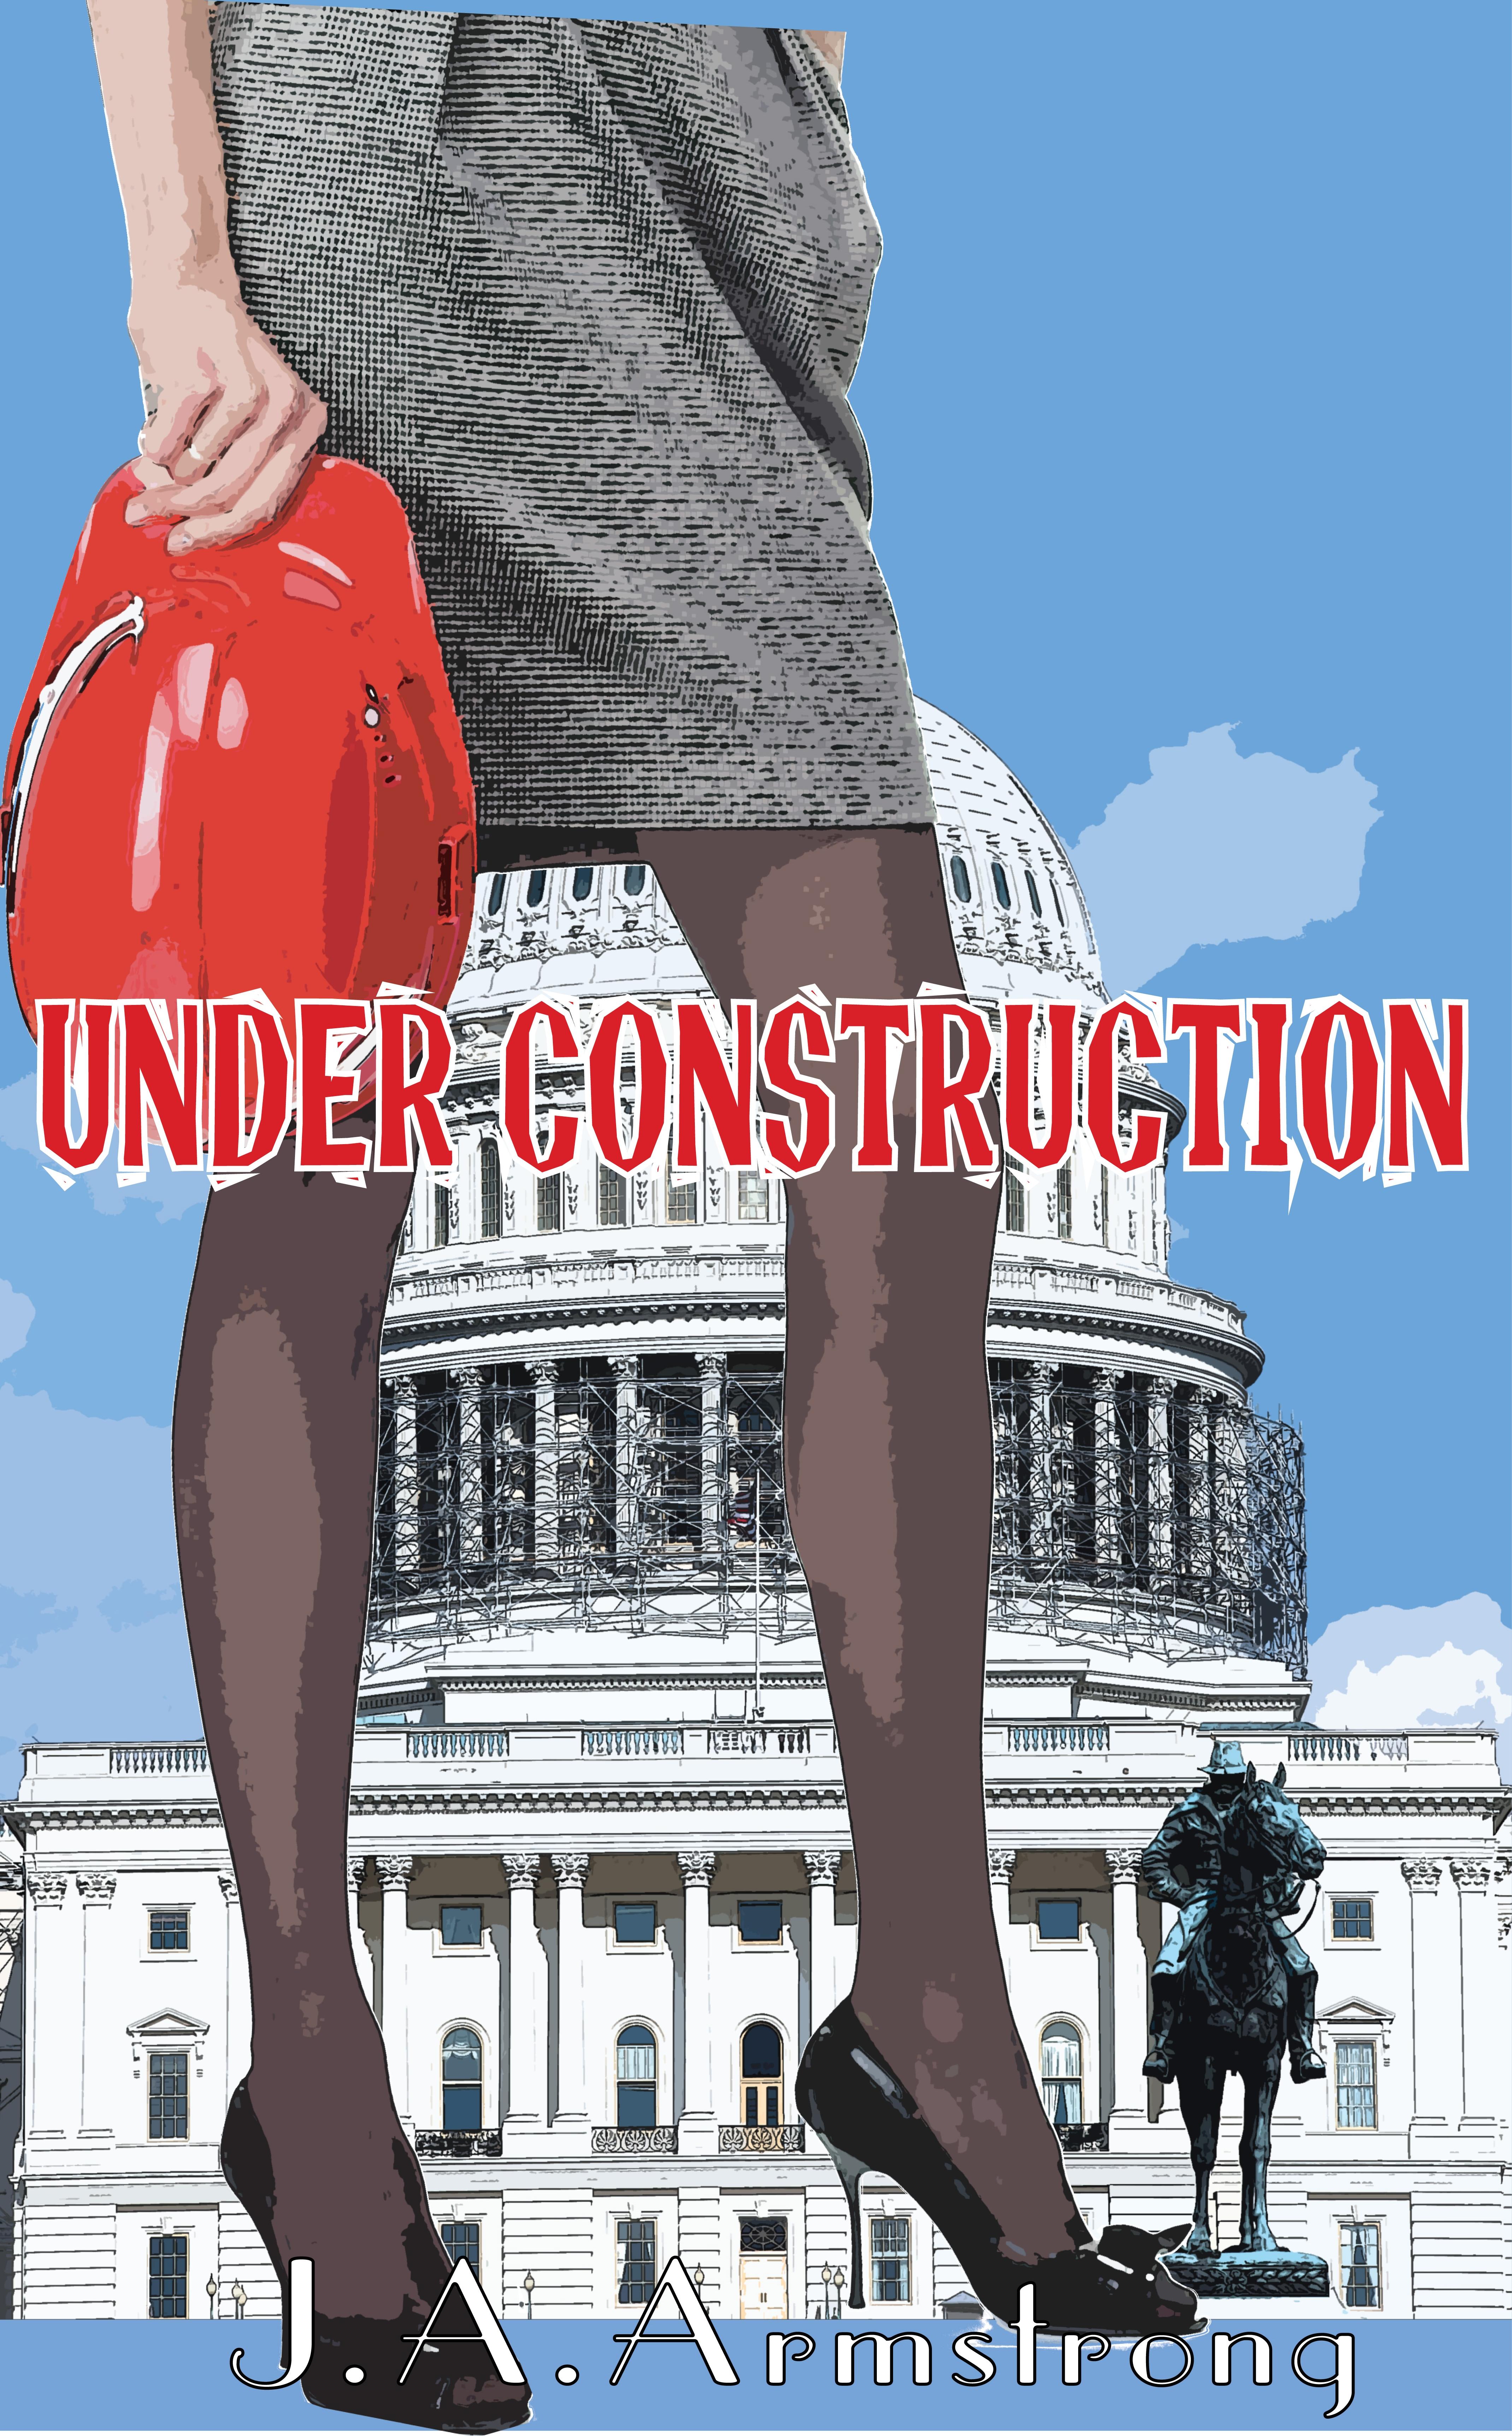 undercontruction1.jpg